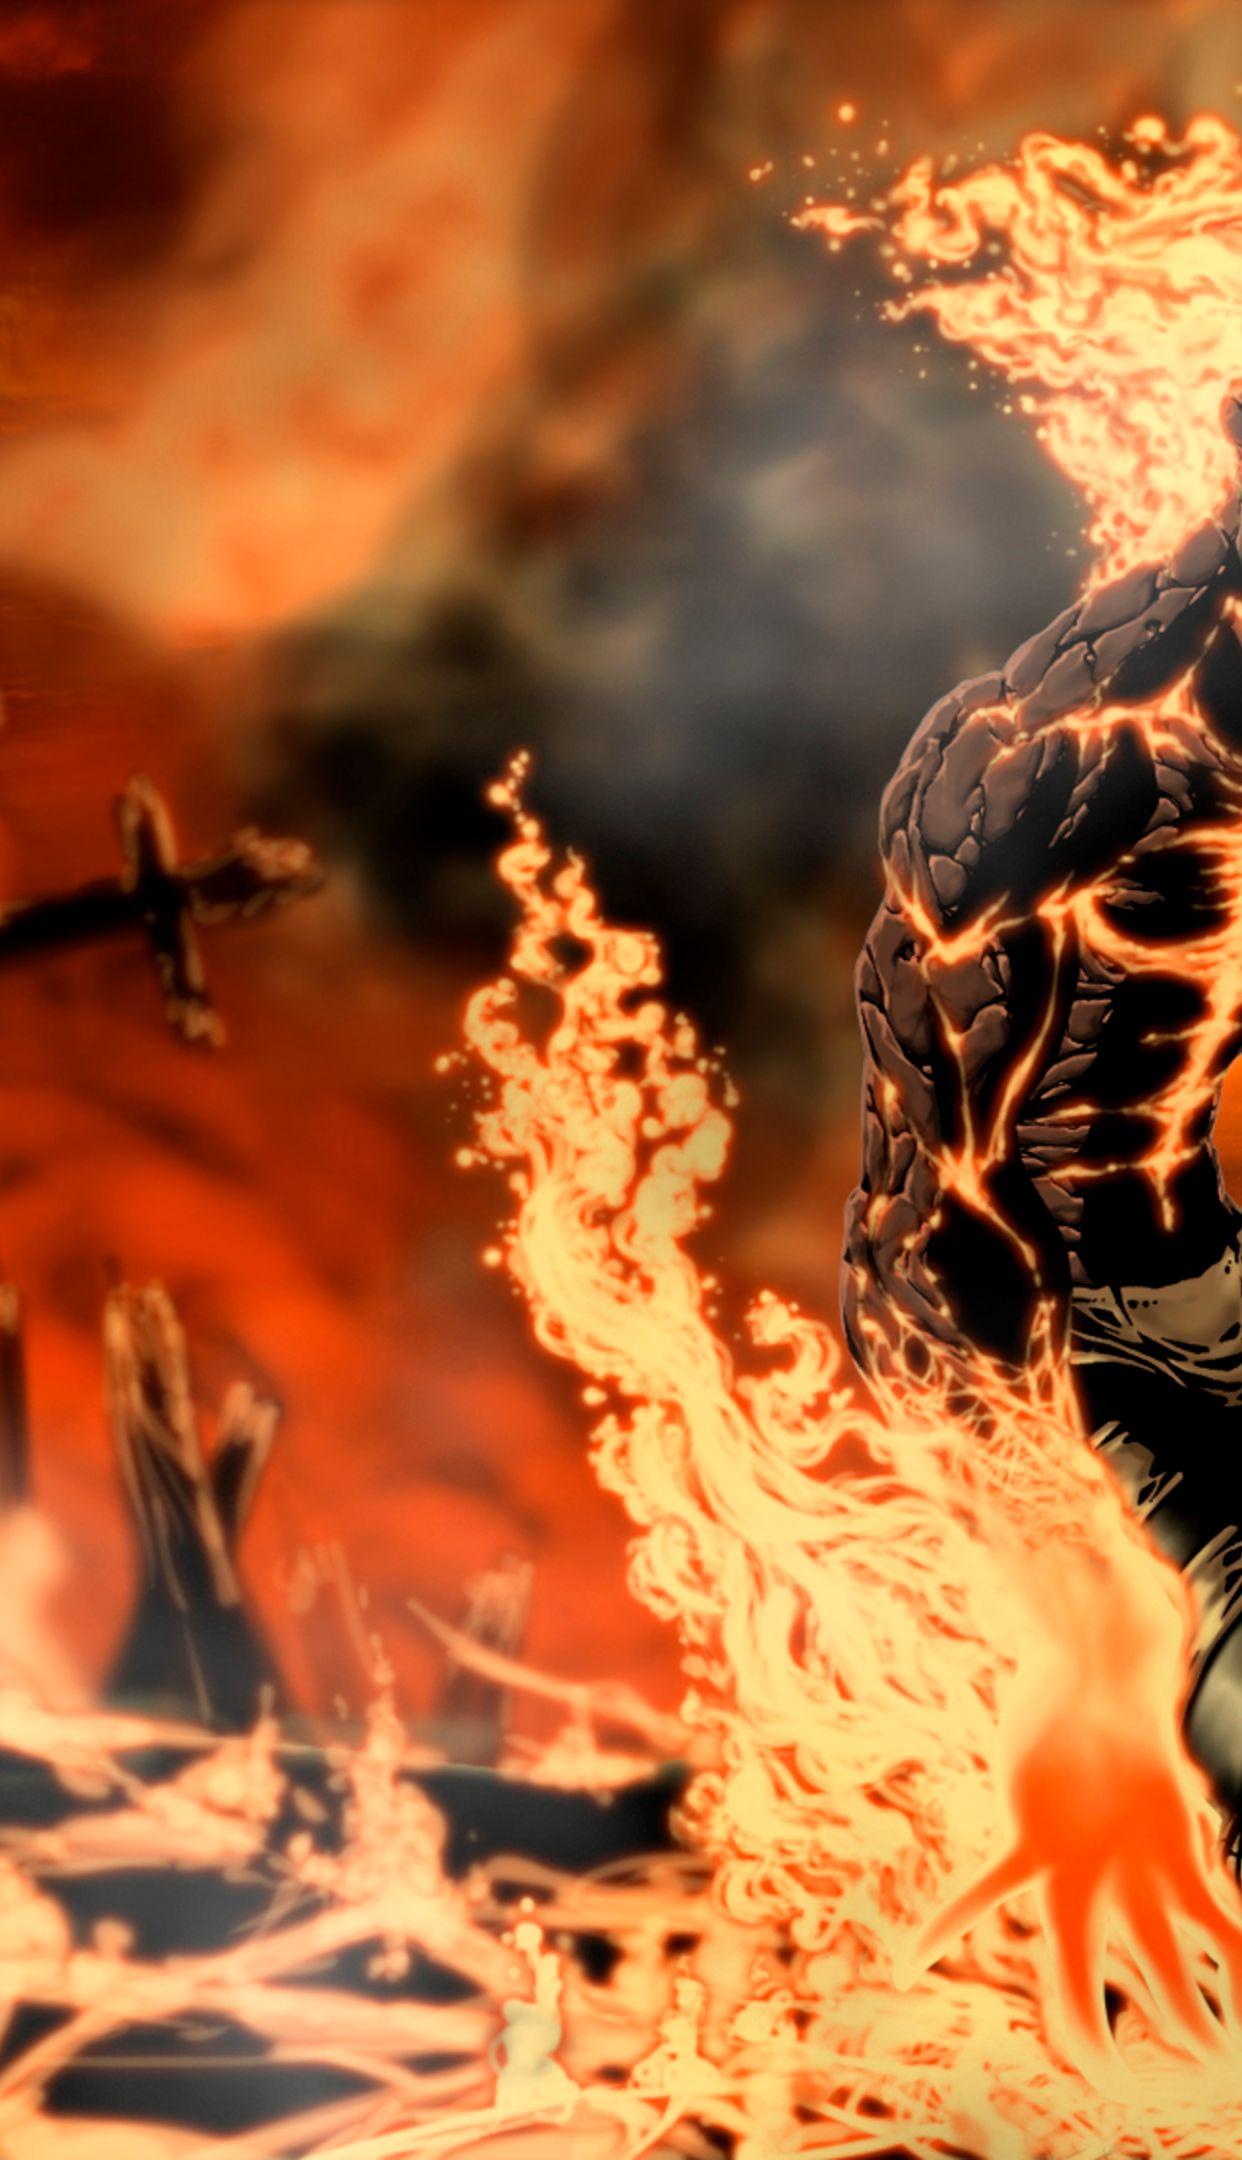 the Burning Vengeance 1242x2208 4k HD wallpaper wallpprscom 1242x2160